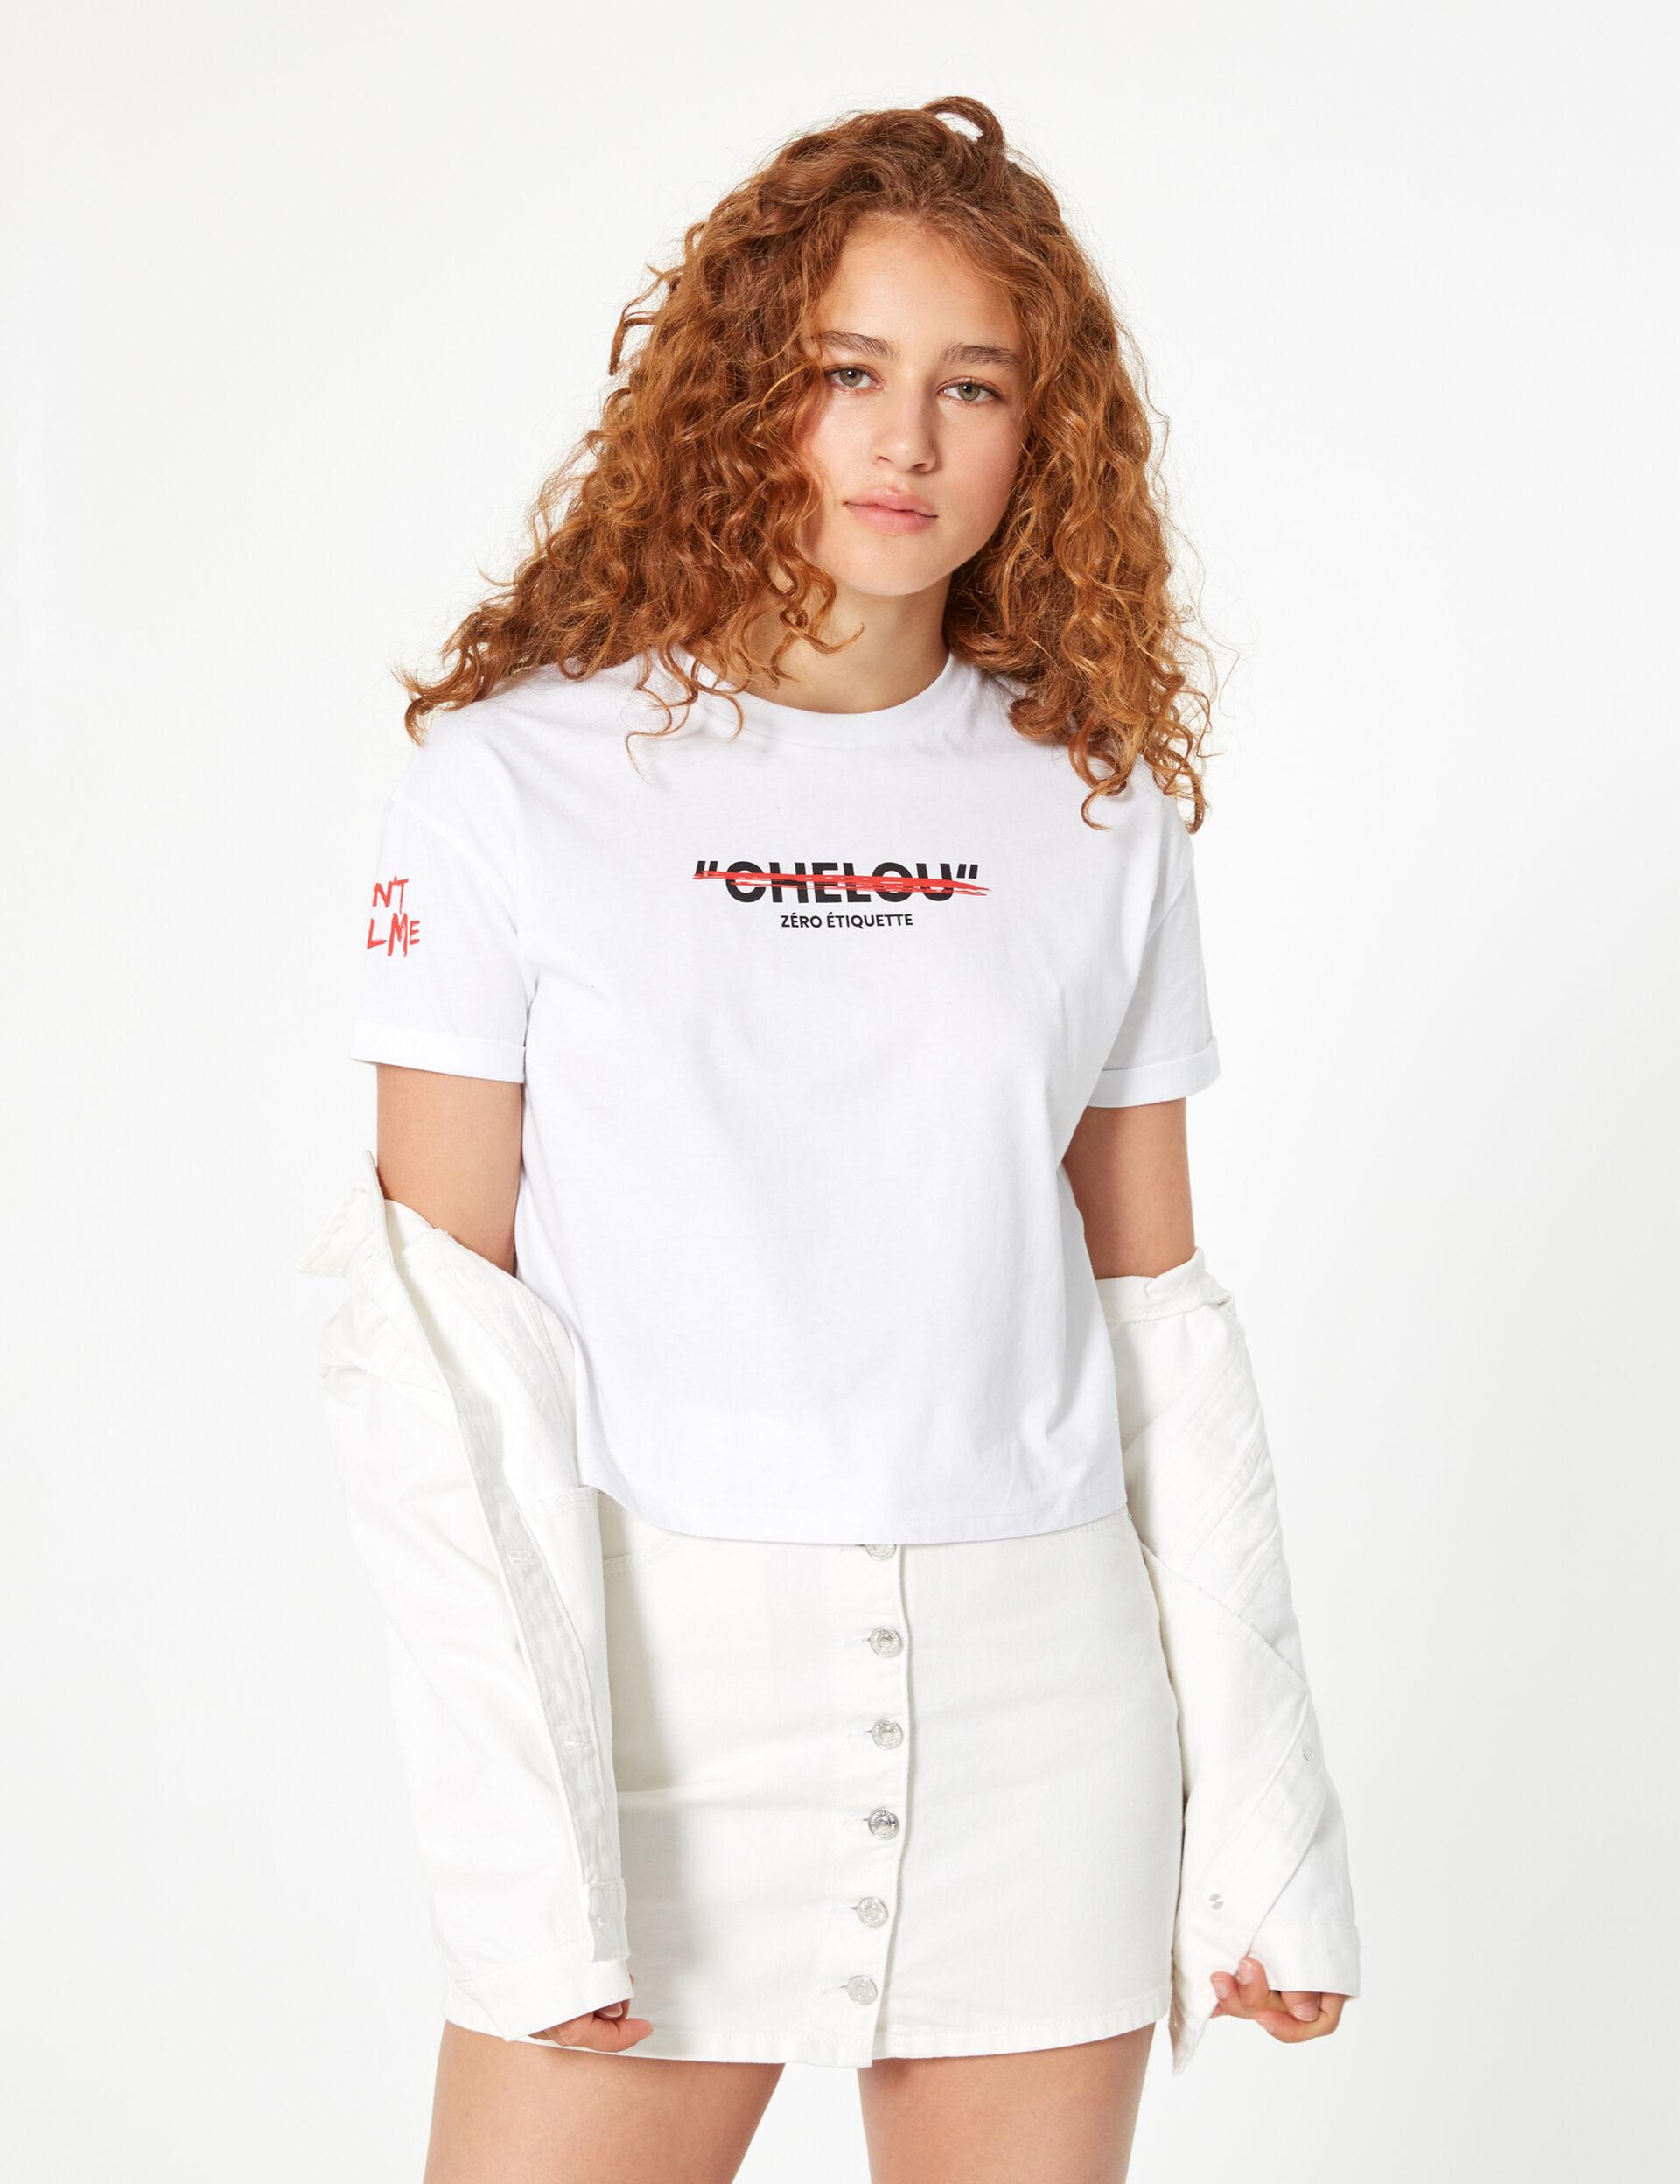 'Don't call me chelou' ('don't call me strange') T-shirt